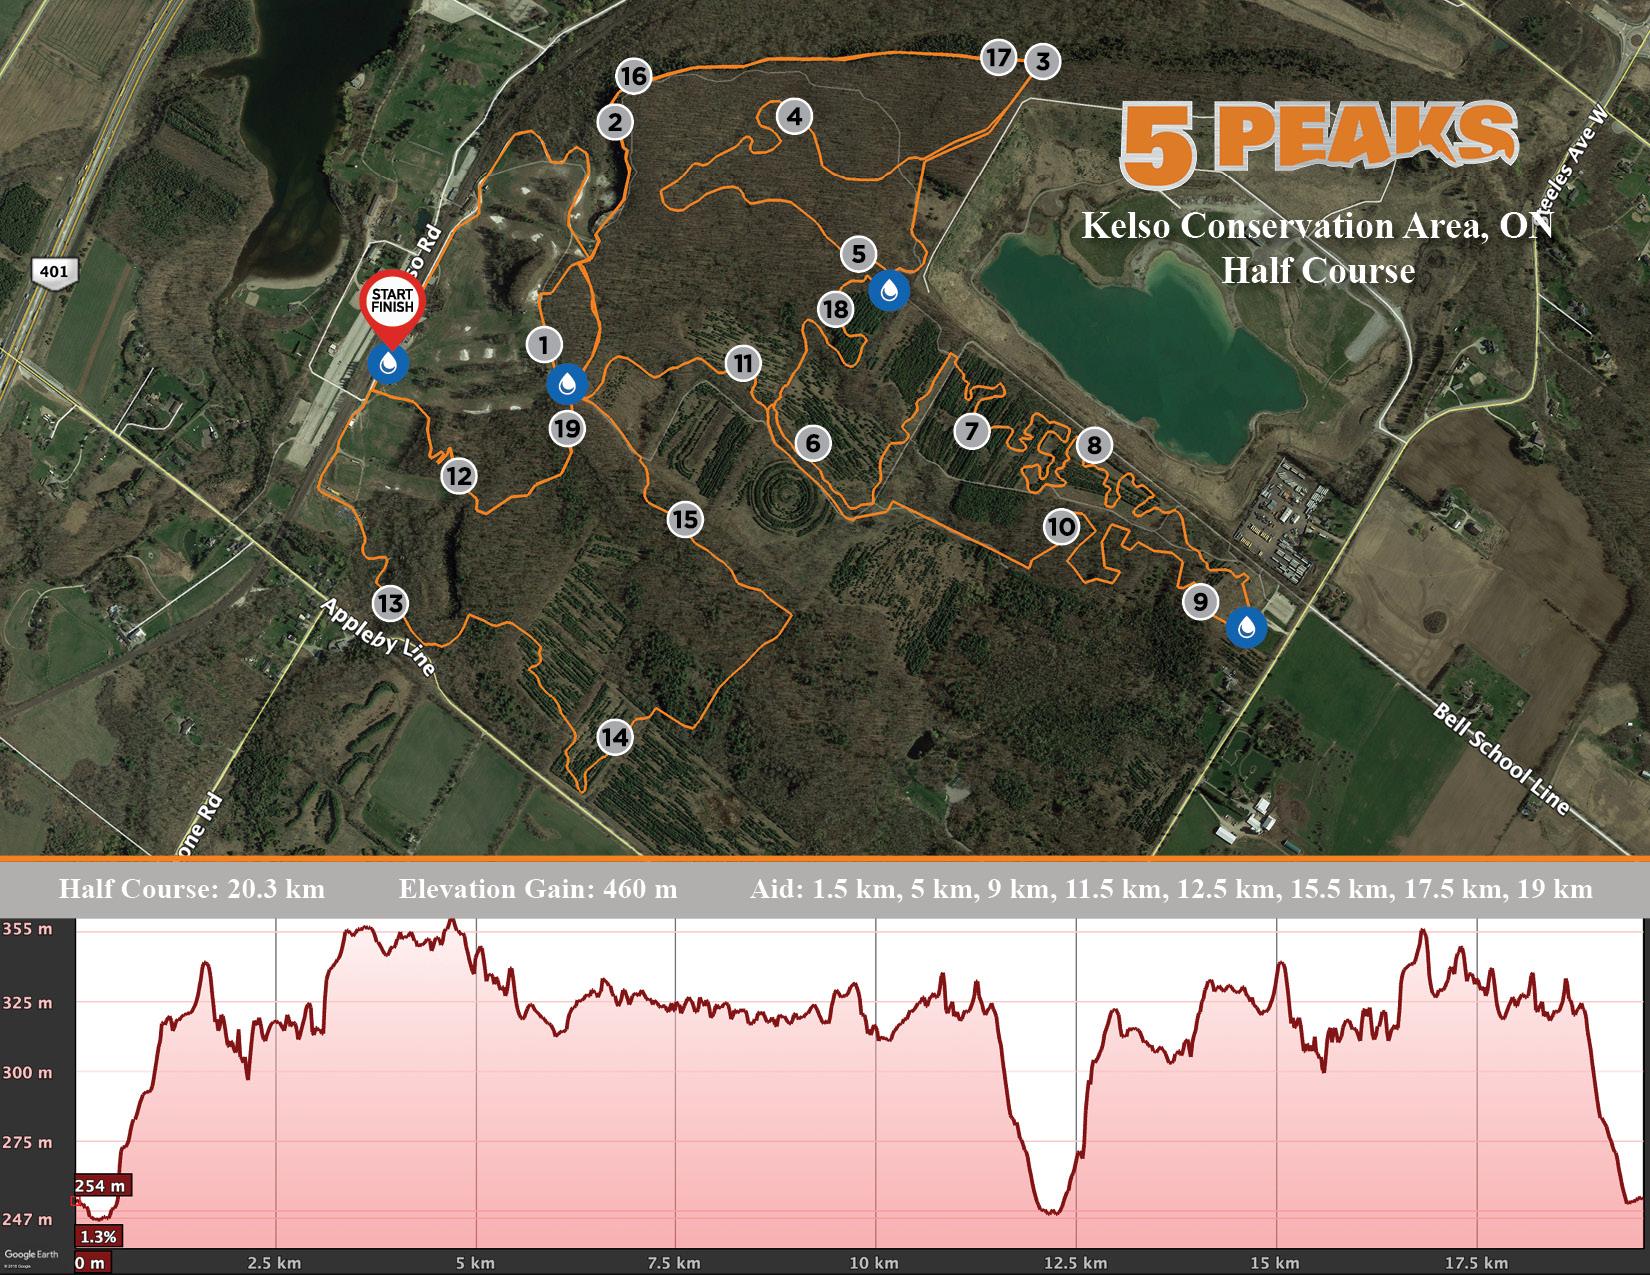 Kelso half marathon map - click to enlarge